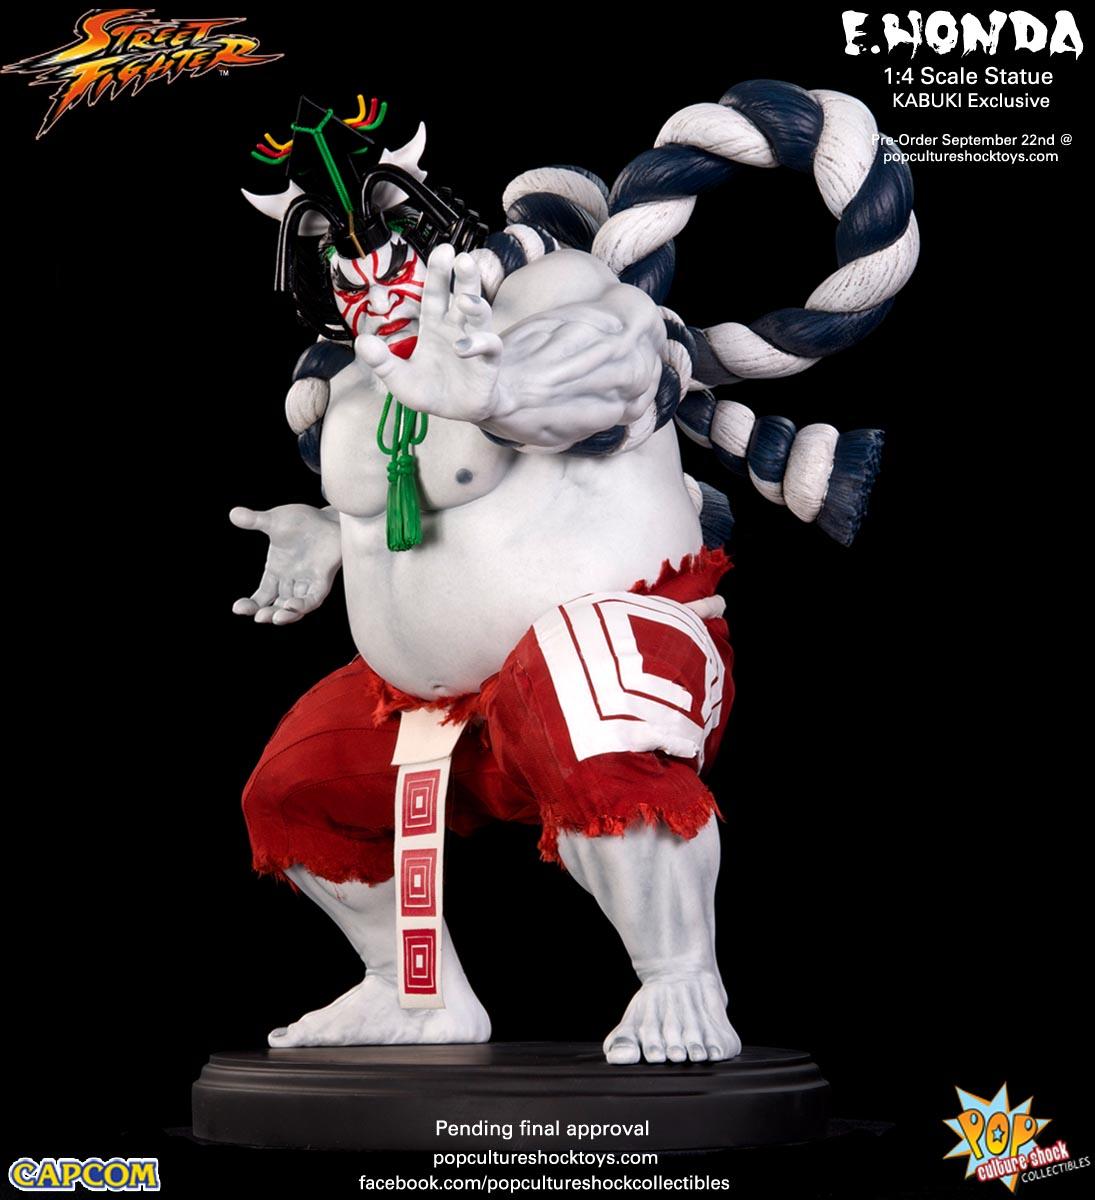 [Pop Culture Shock] Street Fighter: E. Honda 1/4 Statue - Página 3 Street-Fighter-E.-Honda-Kabuki-Statue-008